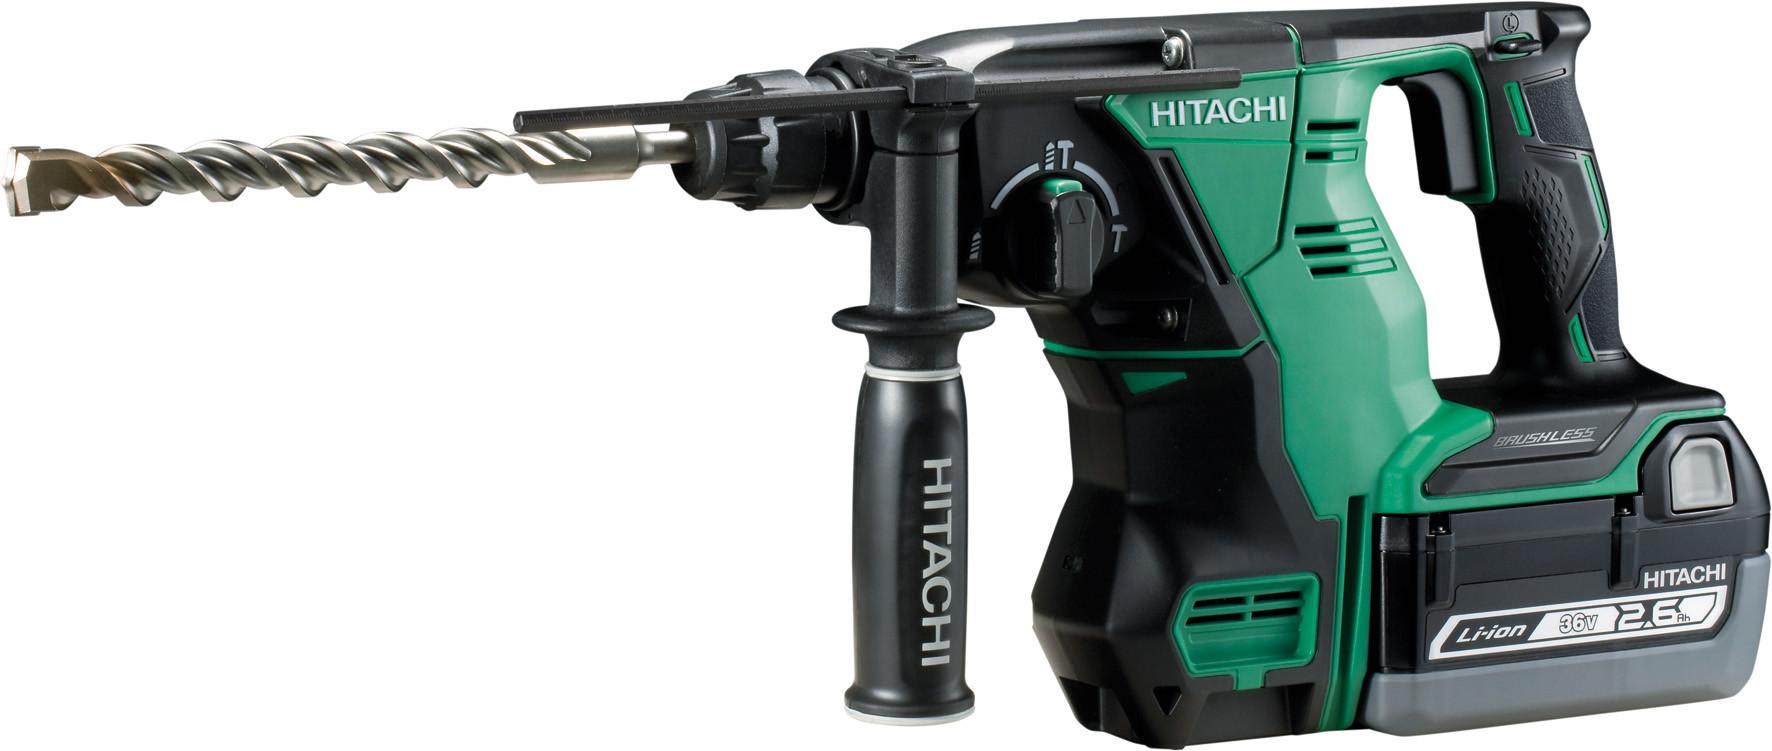 Hitachi dh 36 dbl machines - Perforateur sans fil hitachi ...